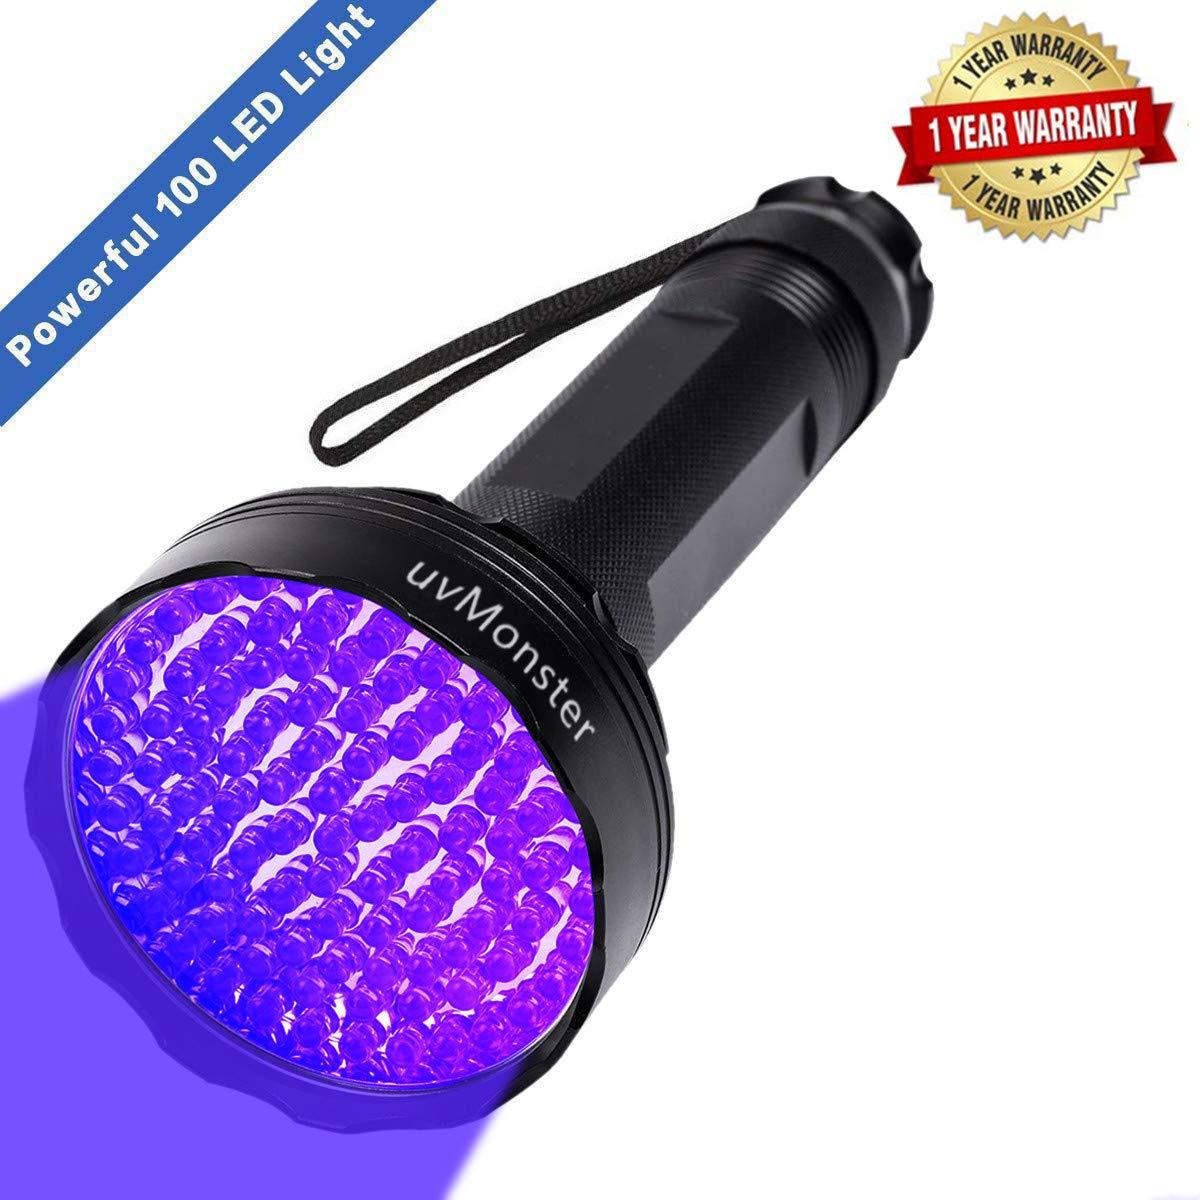 UV Blacklight Flashlight, Super Bright 100 LED 395nm Pet Dog Cat Urine Detector light Flashlight for Pet Urine Stains, UV Black light Flashlight for Bed Bugs, Scorpions, Home&Hotel (1) by uvMonster